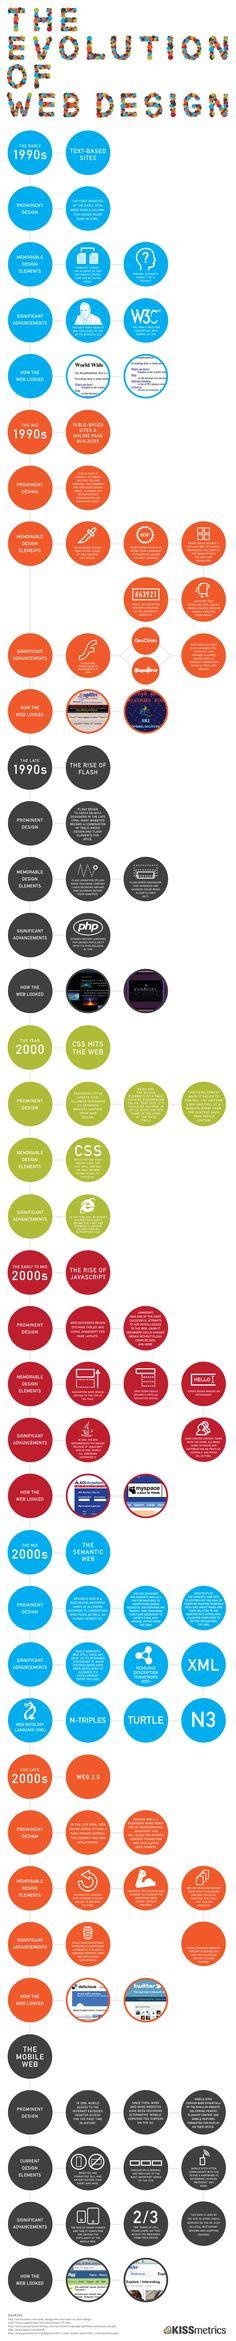 web evolution #infographic